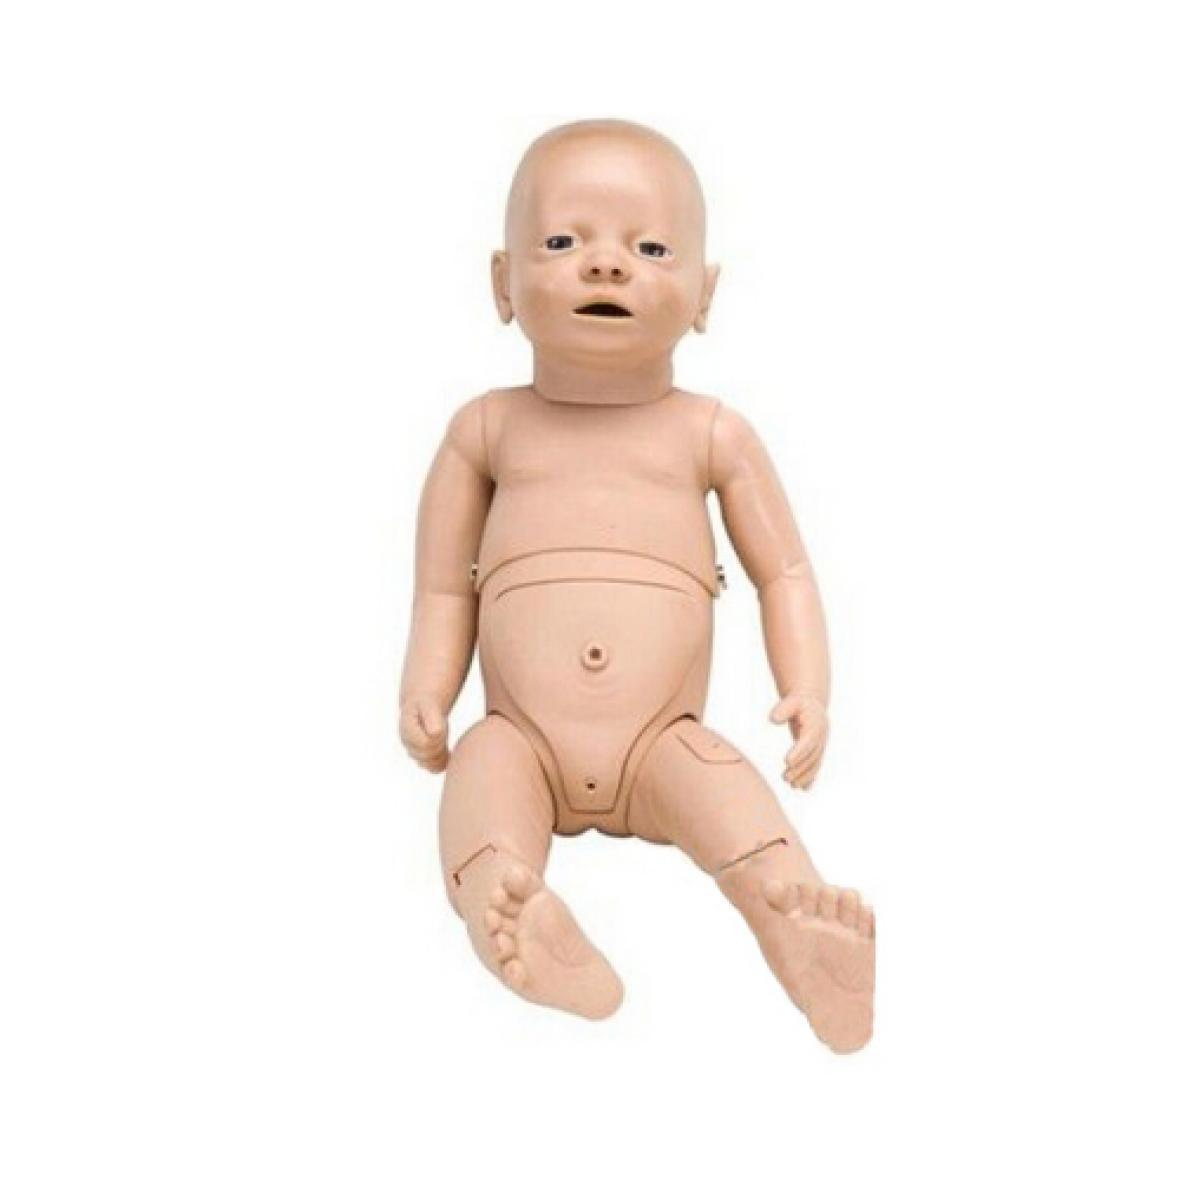 PD5115 婴儿护理模型,新生儿